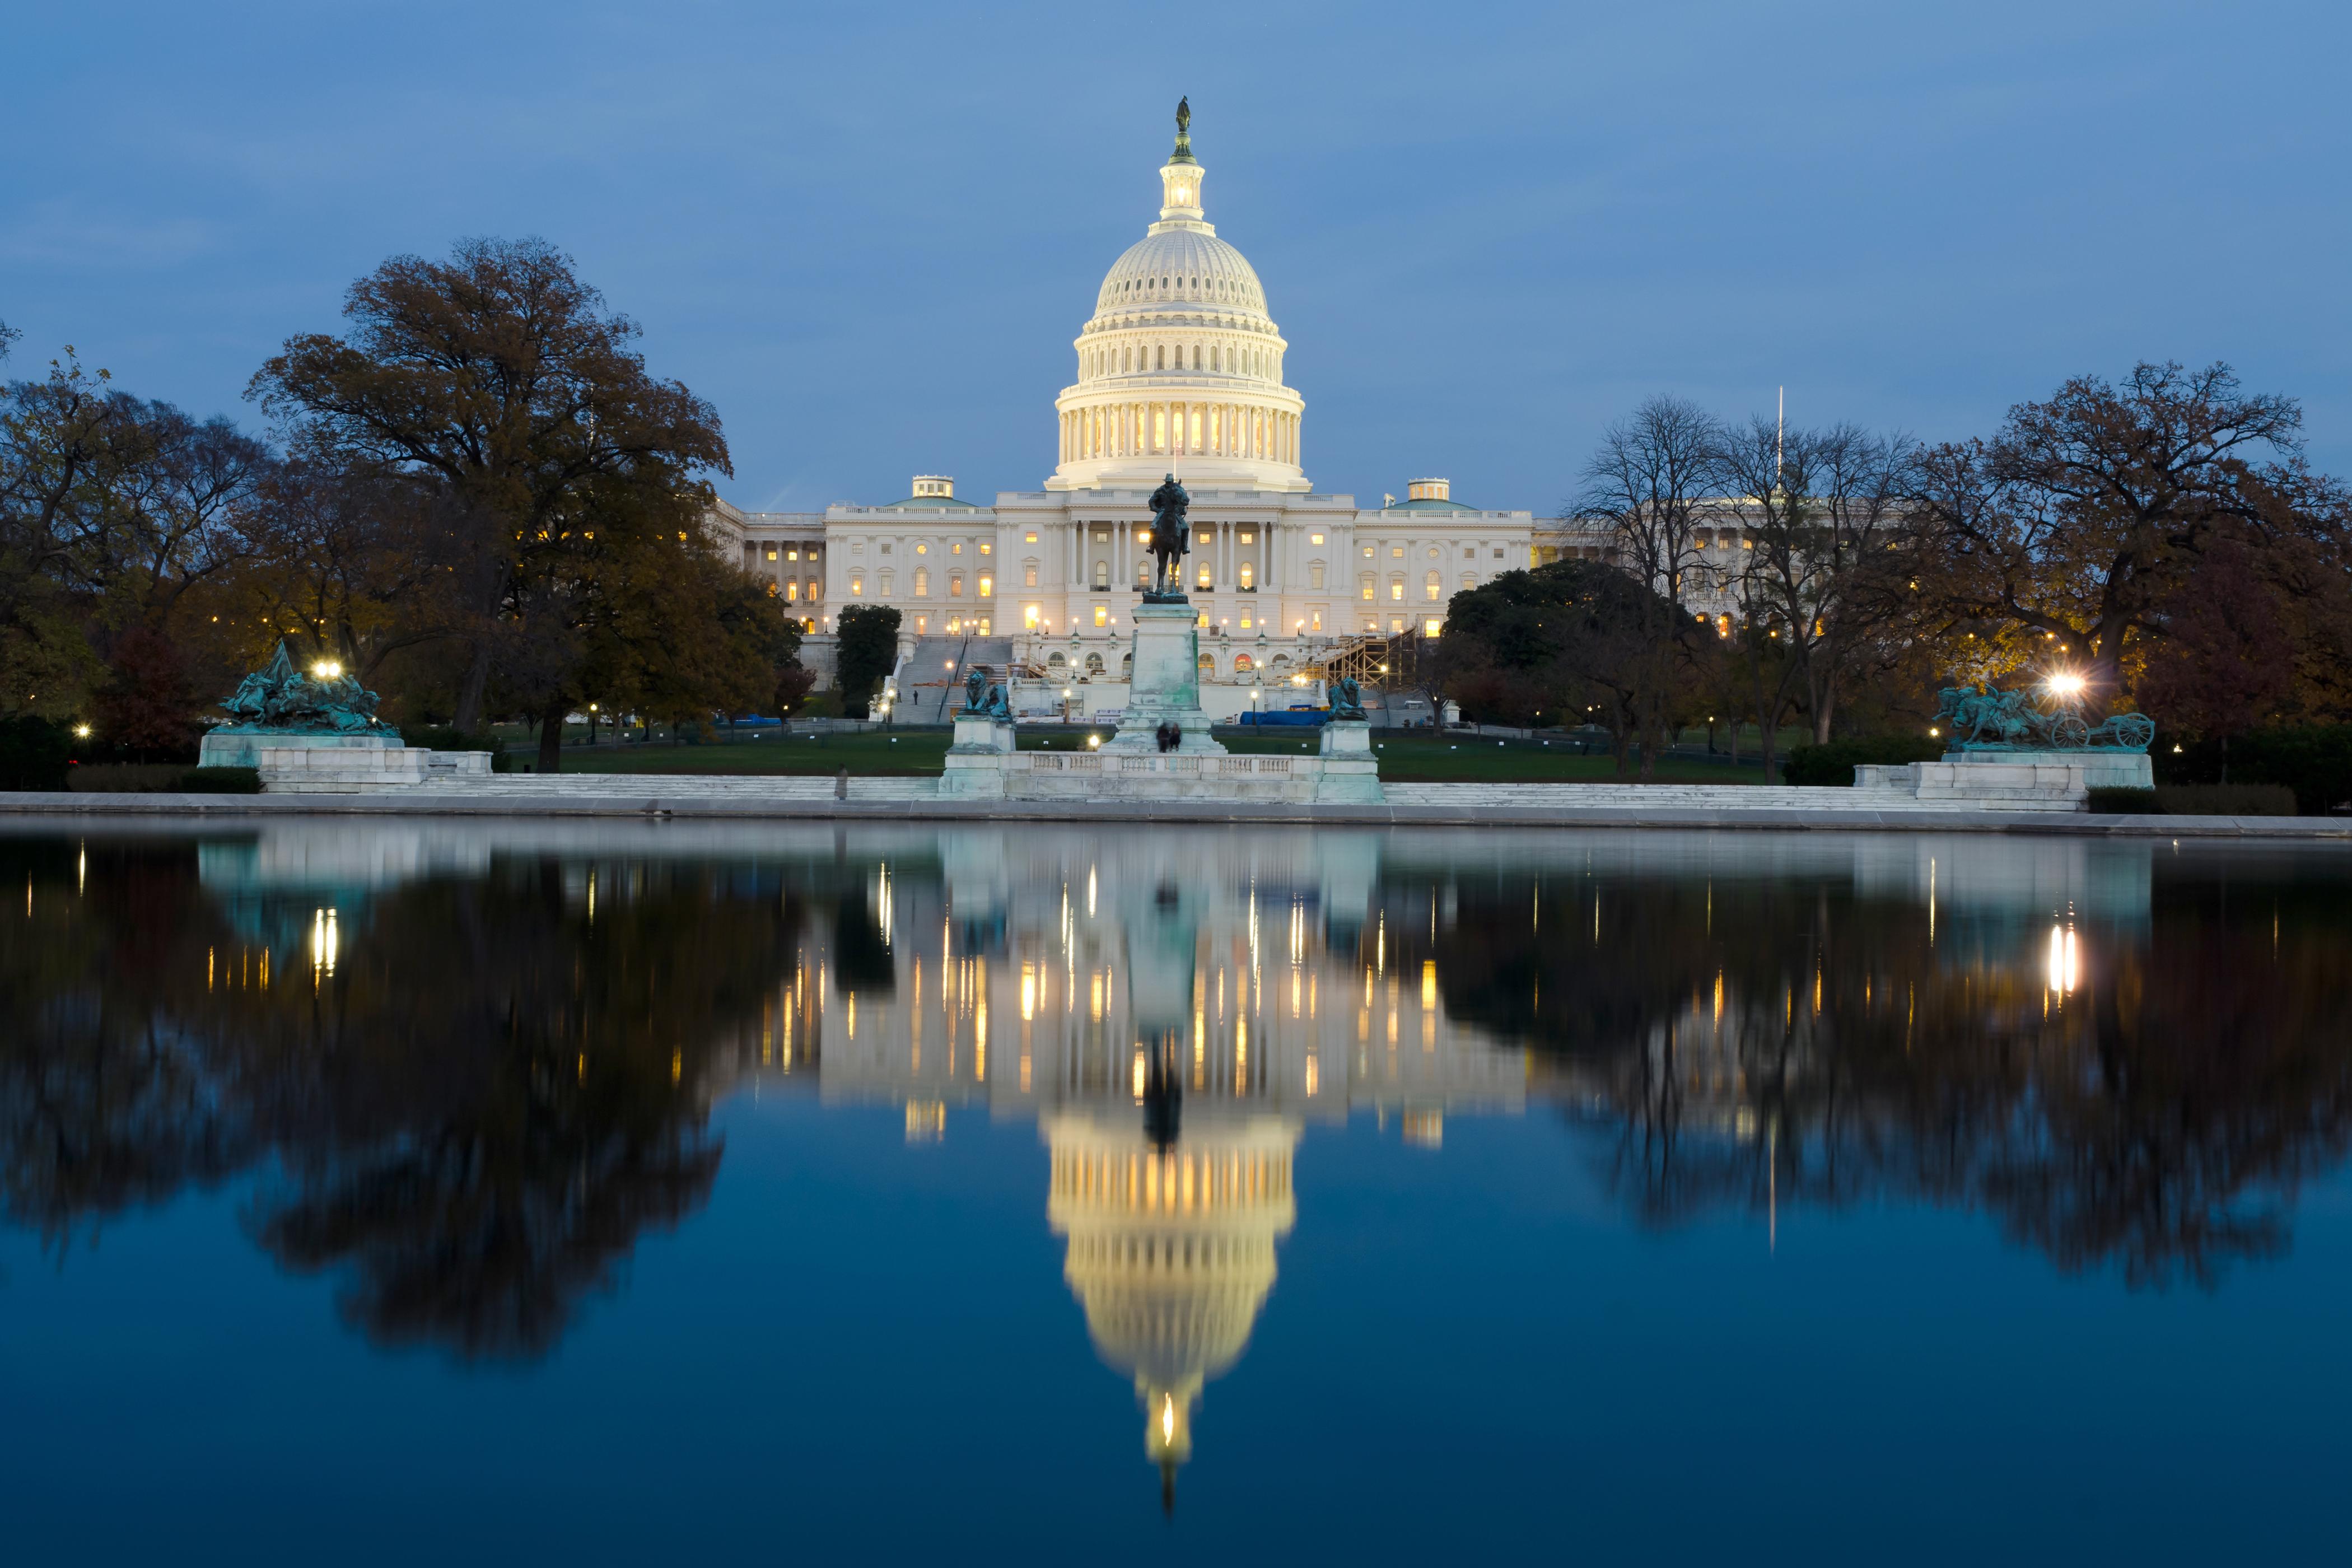 https://depositphotos.com/15257991/stock-photo-view-on-capitol-in-washington.html